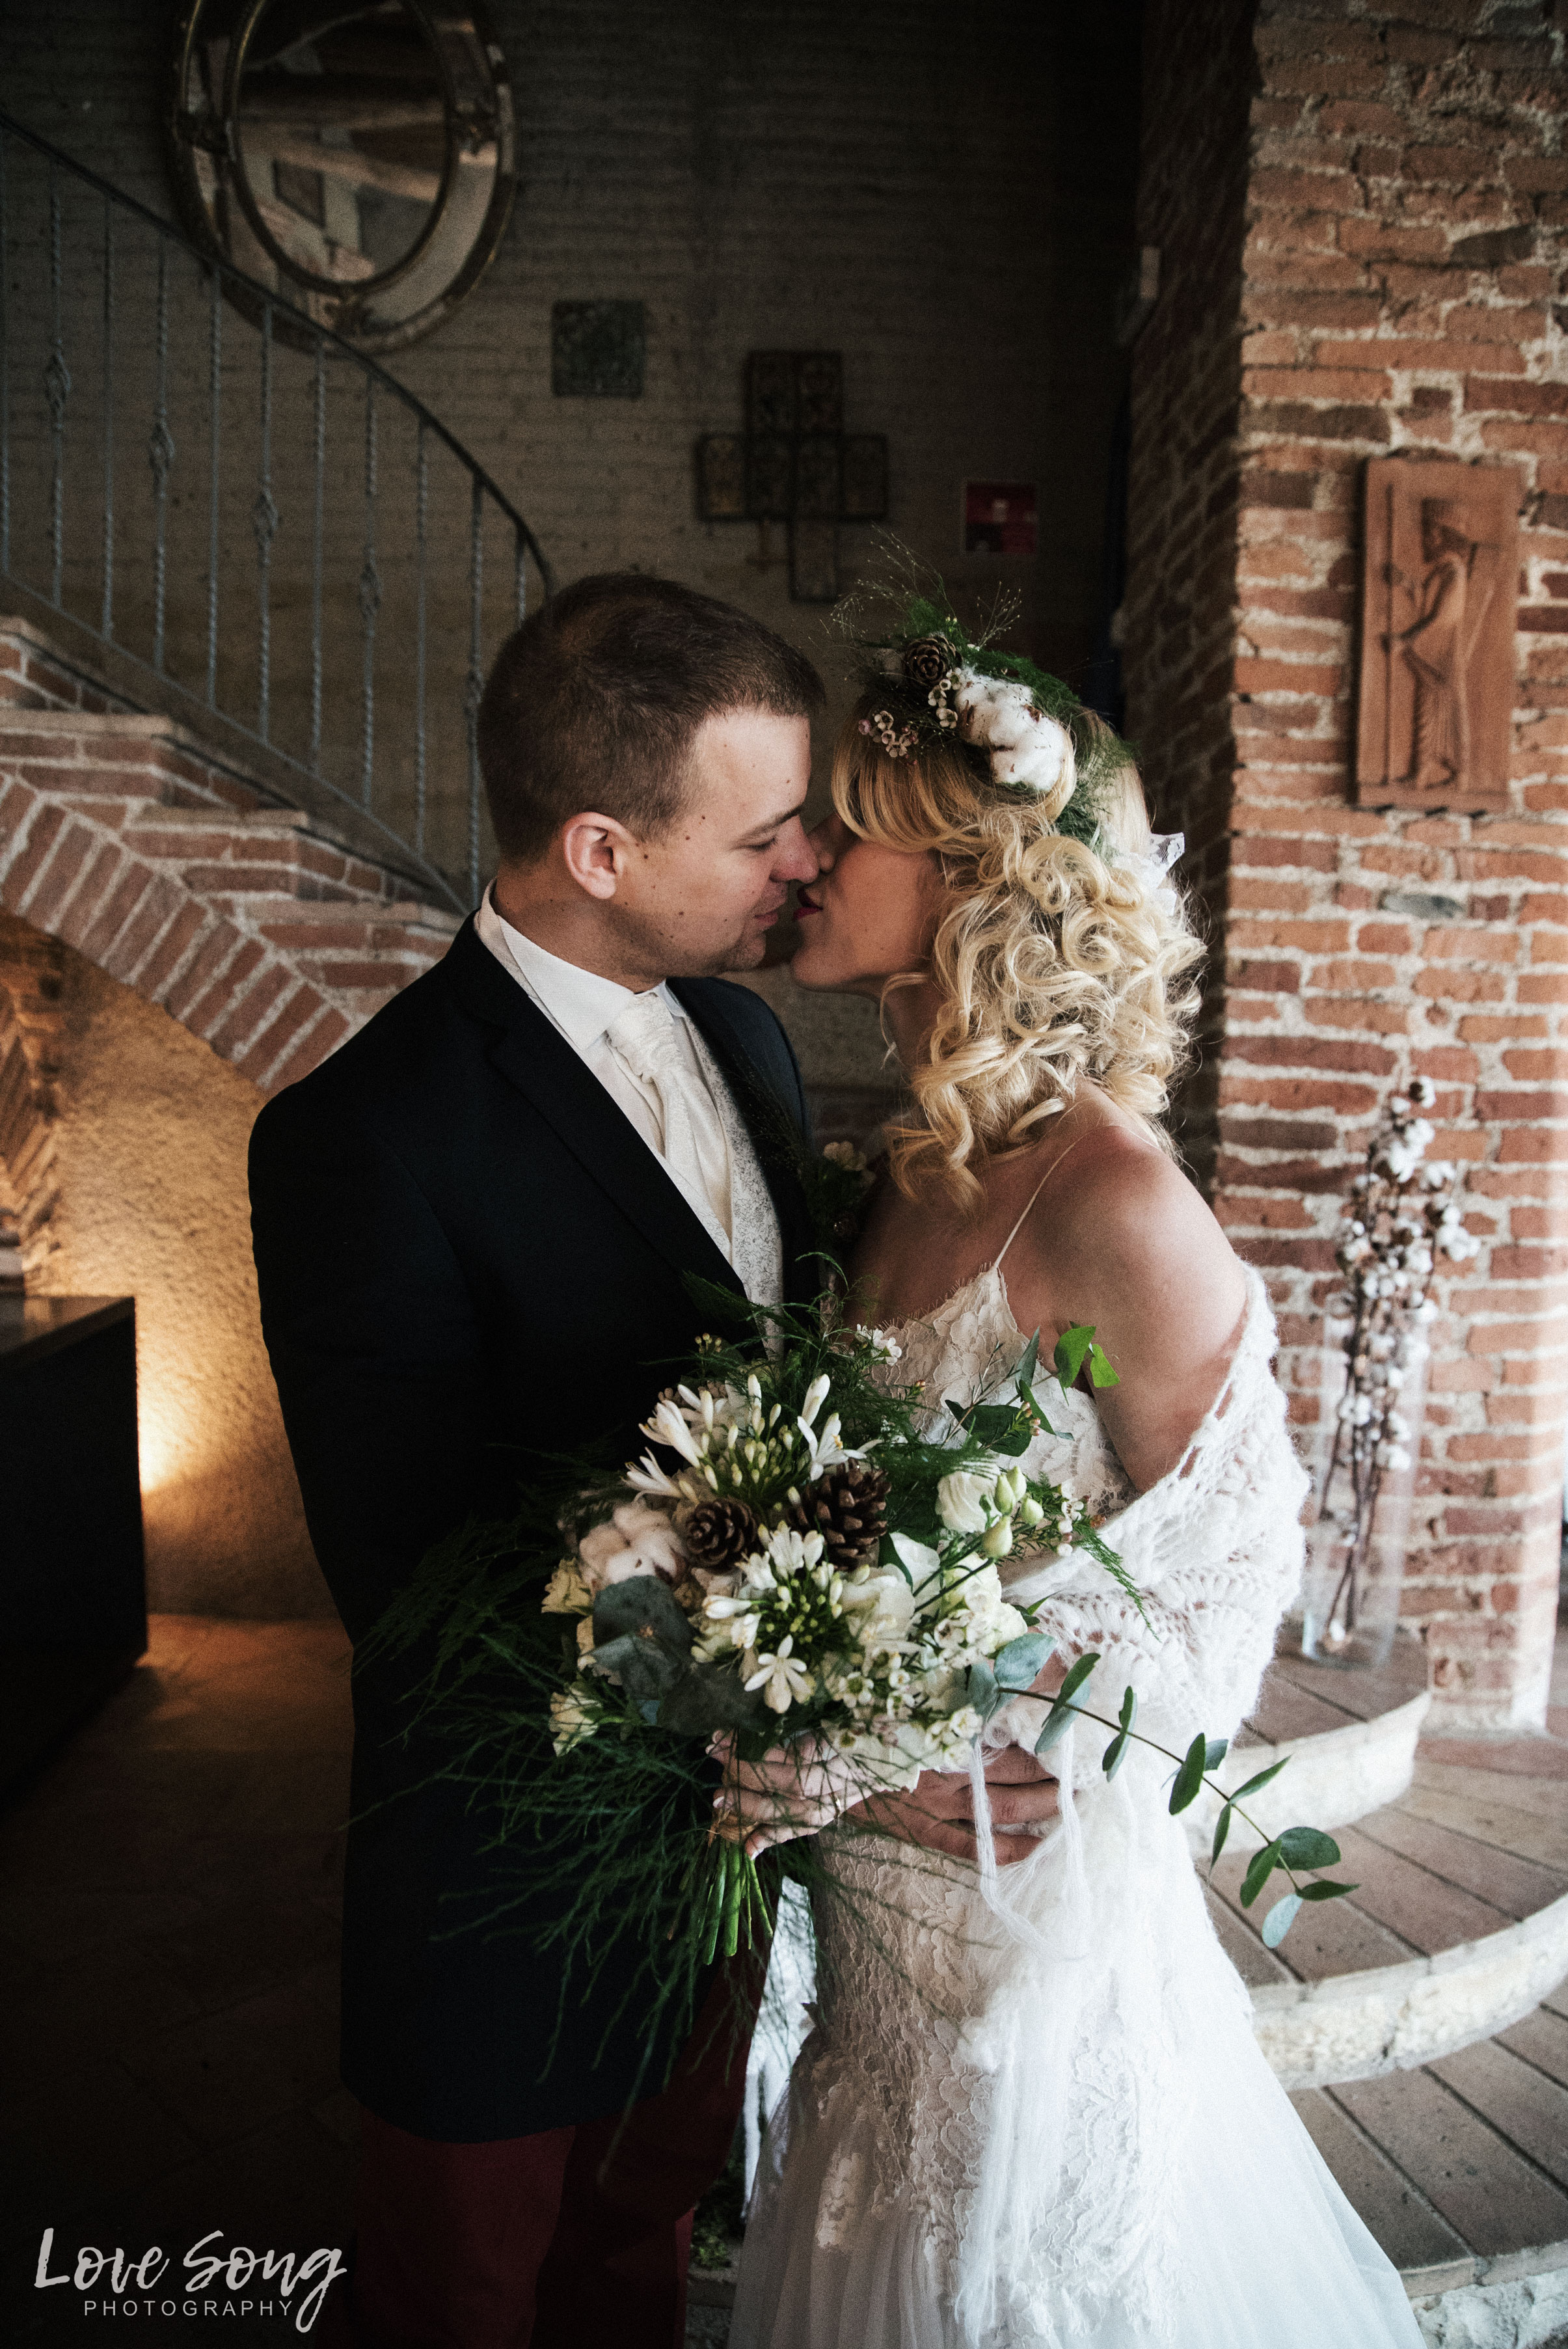 Mariage Hiver Scandinave contemporain